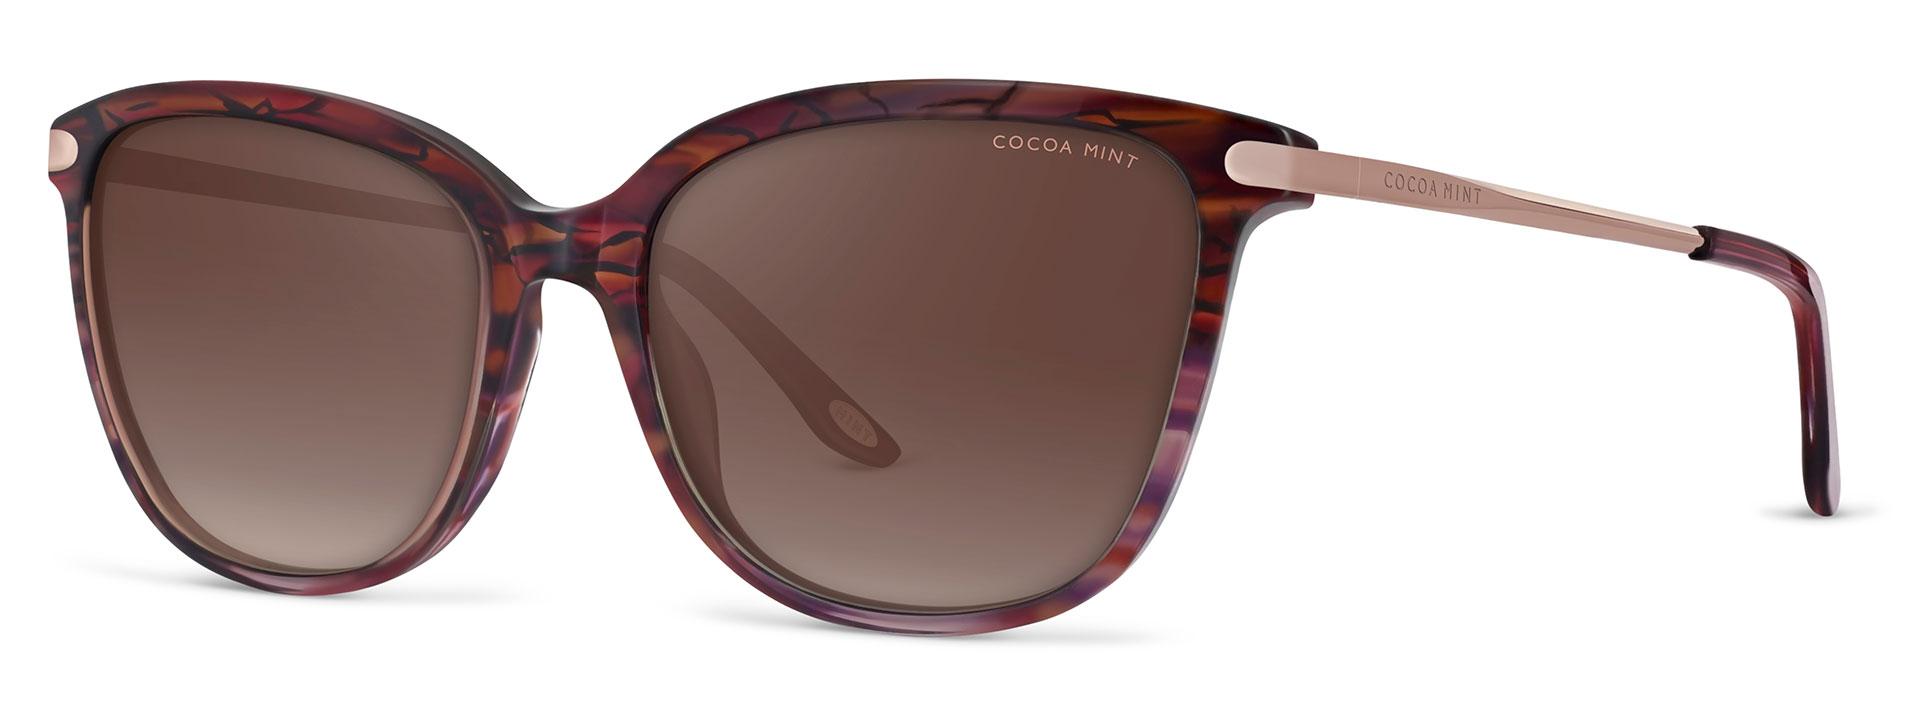 Cocoa Mint Sun Glasses - Red - CMS2070-C2